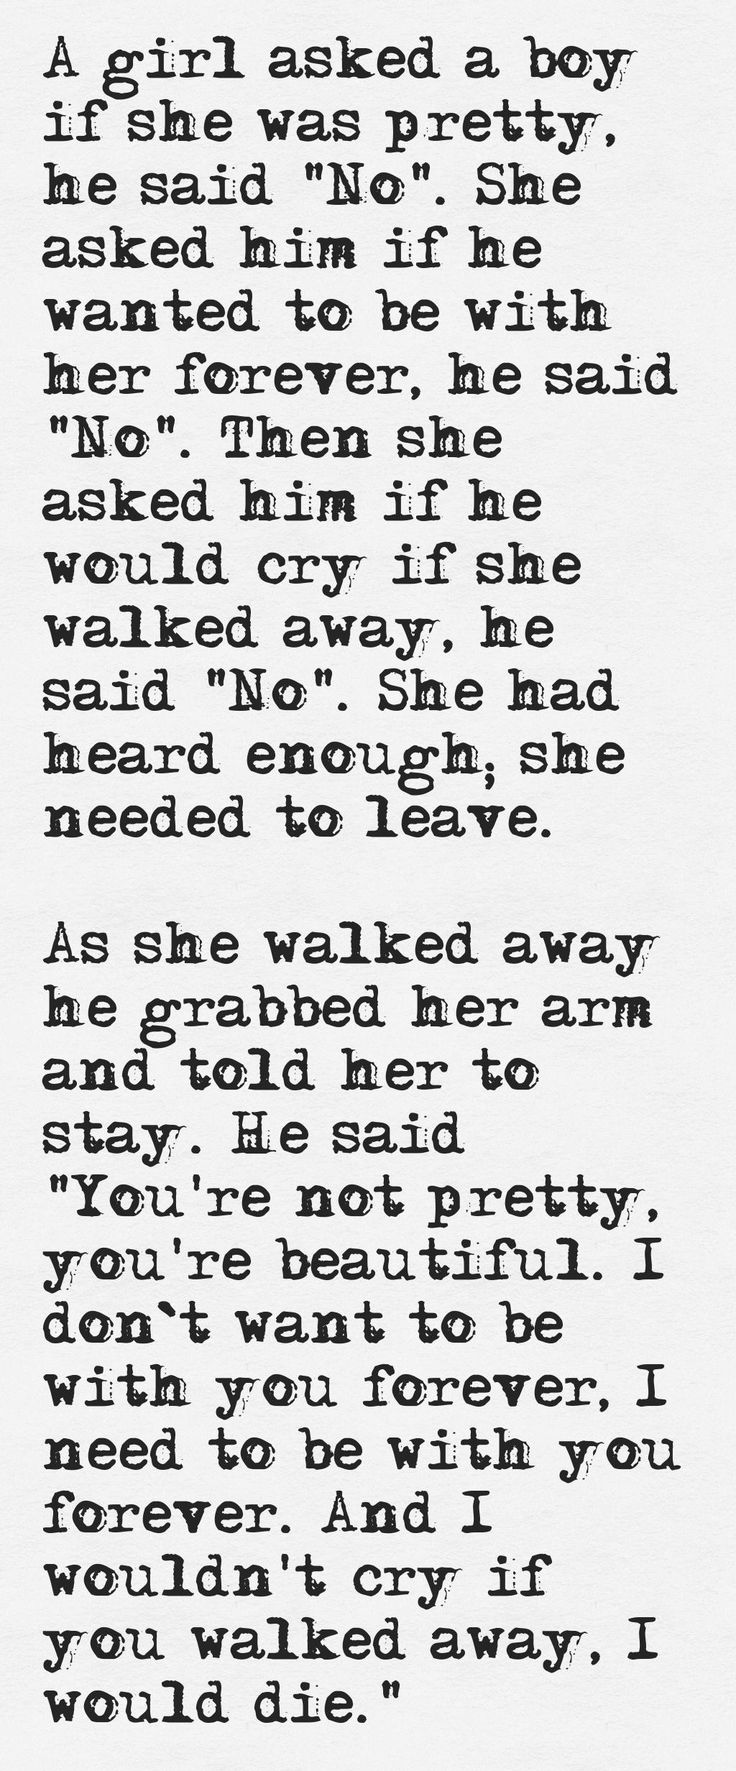 Mcm Quotes For Your Boyfriend. QuotesGram